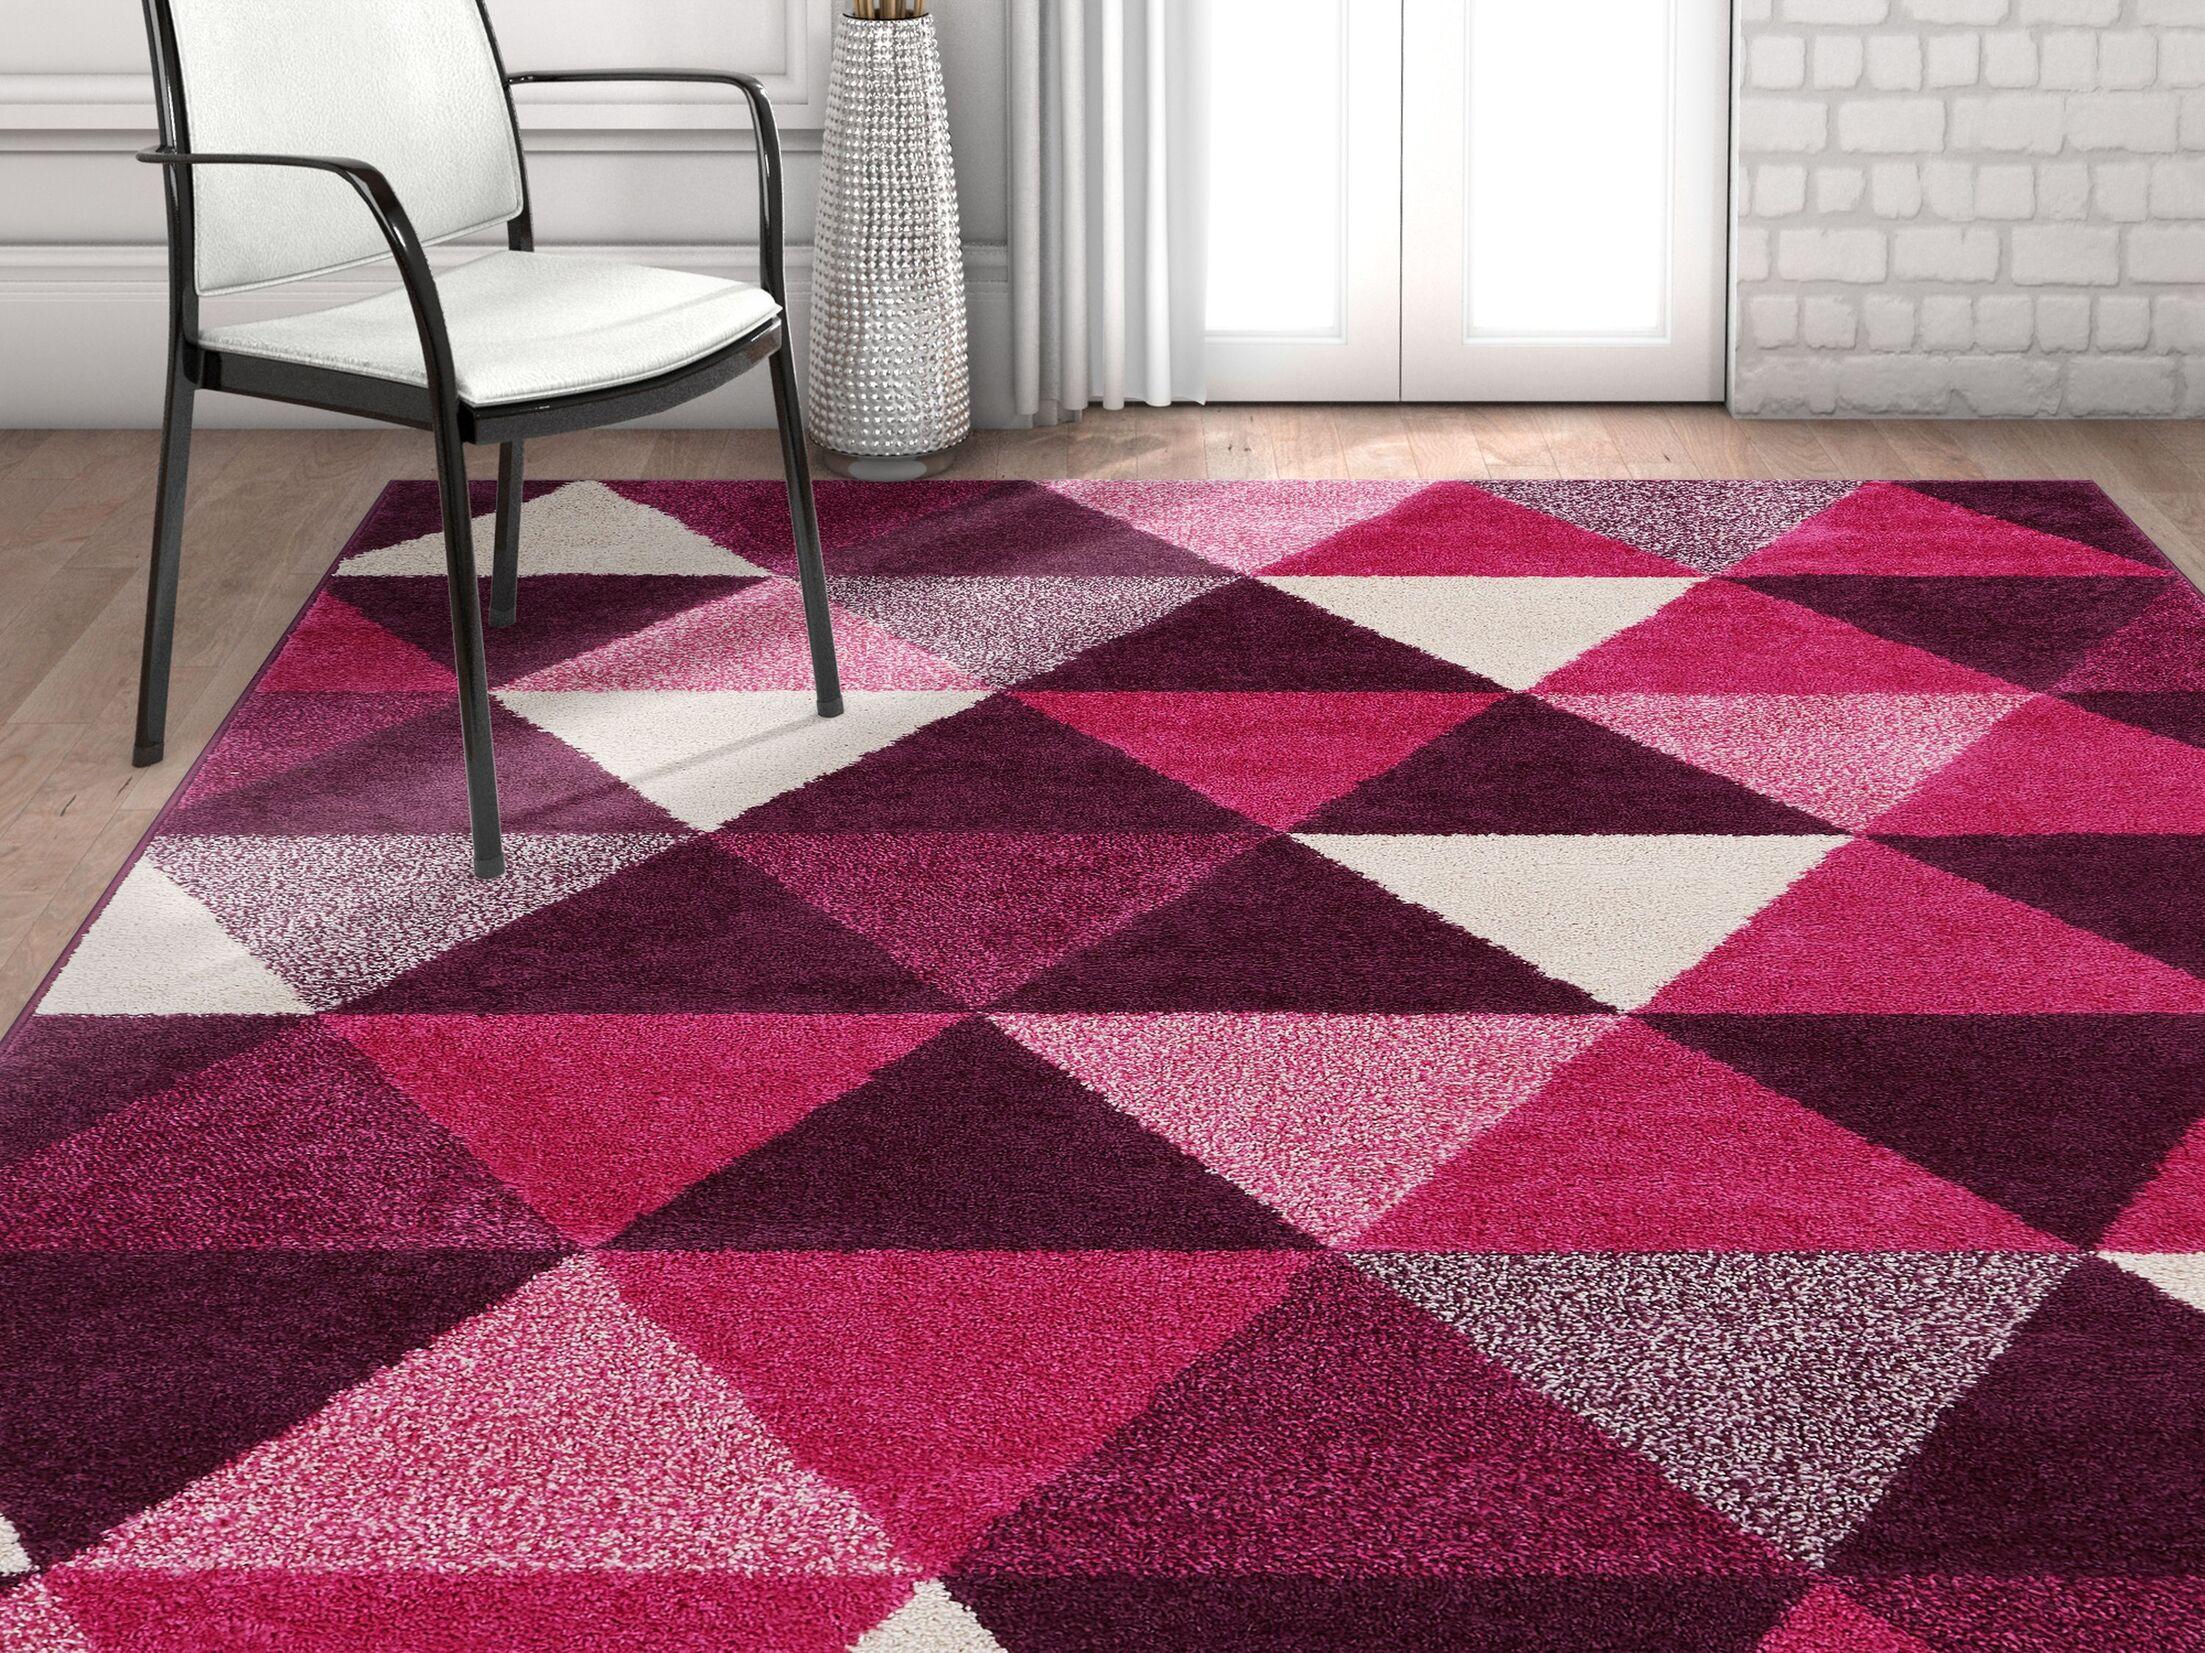 Dumas Geometric Triangle Purple Area Rug Rug Size: Rectangle 7'10